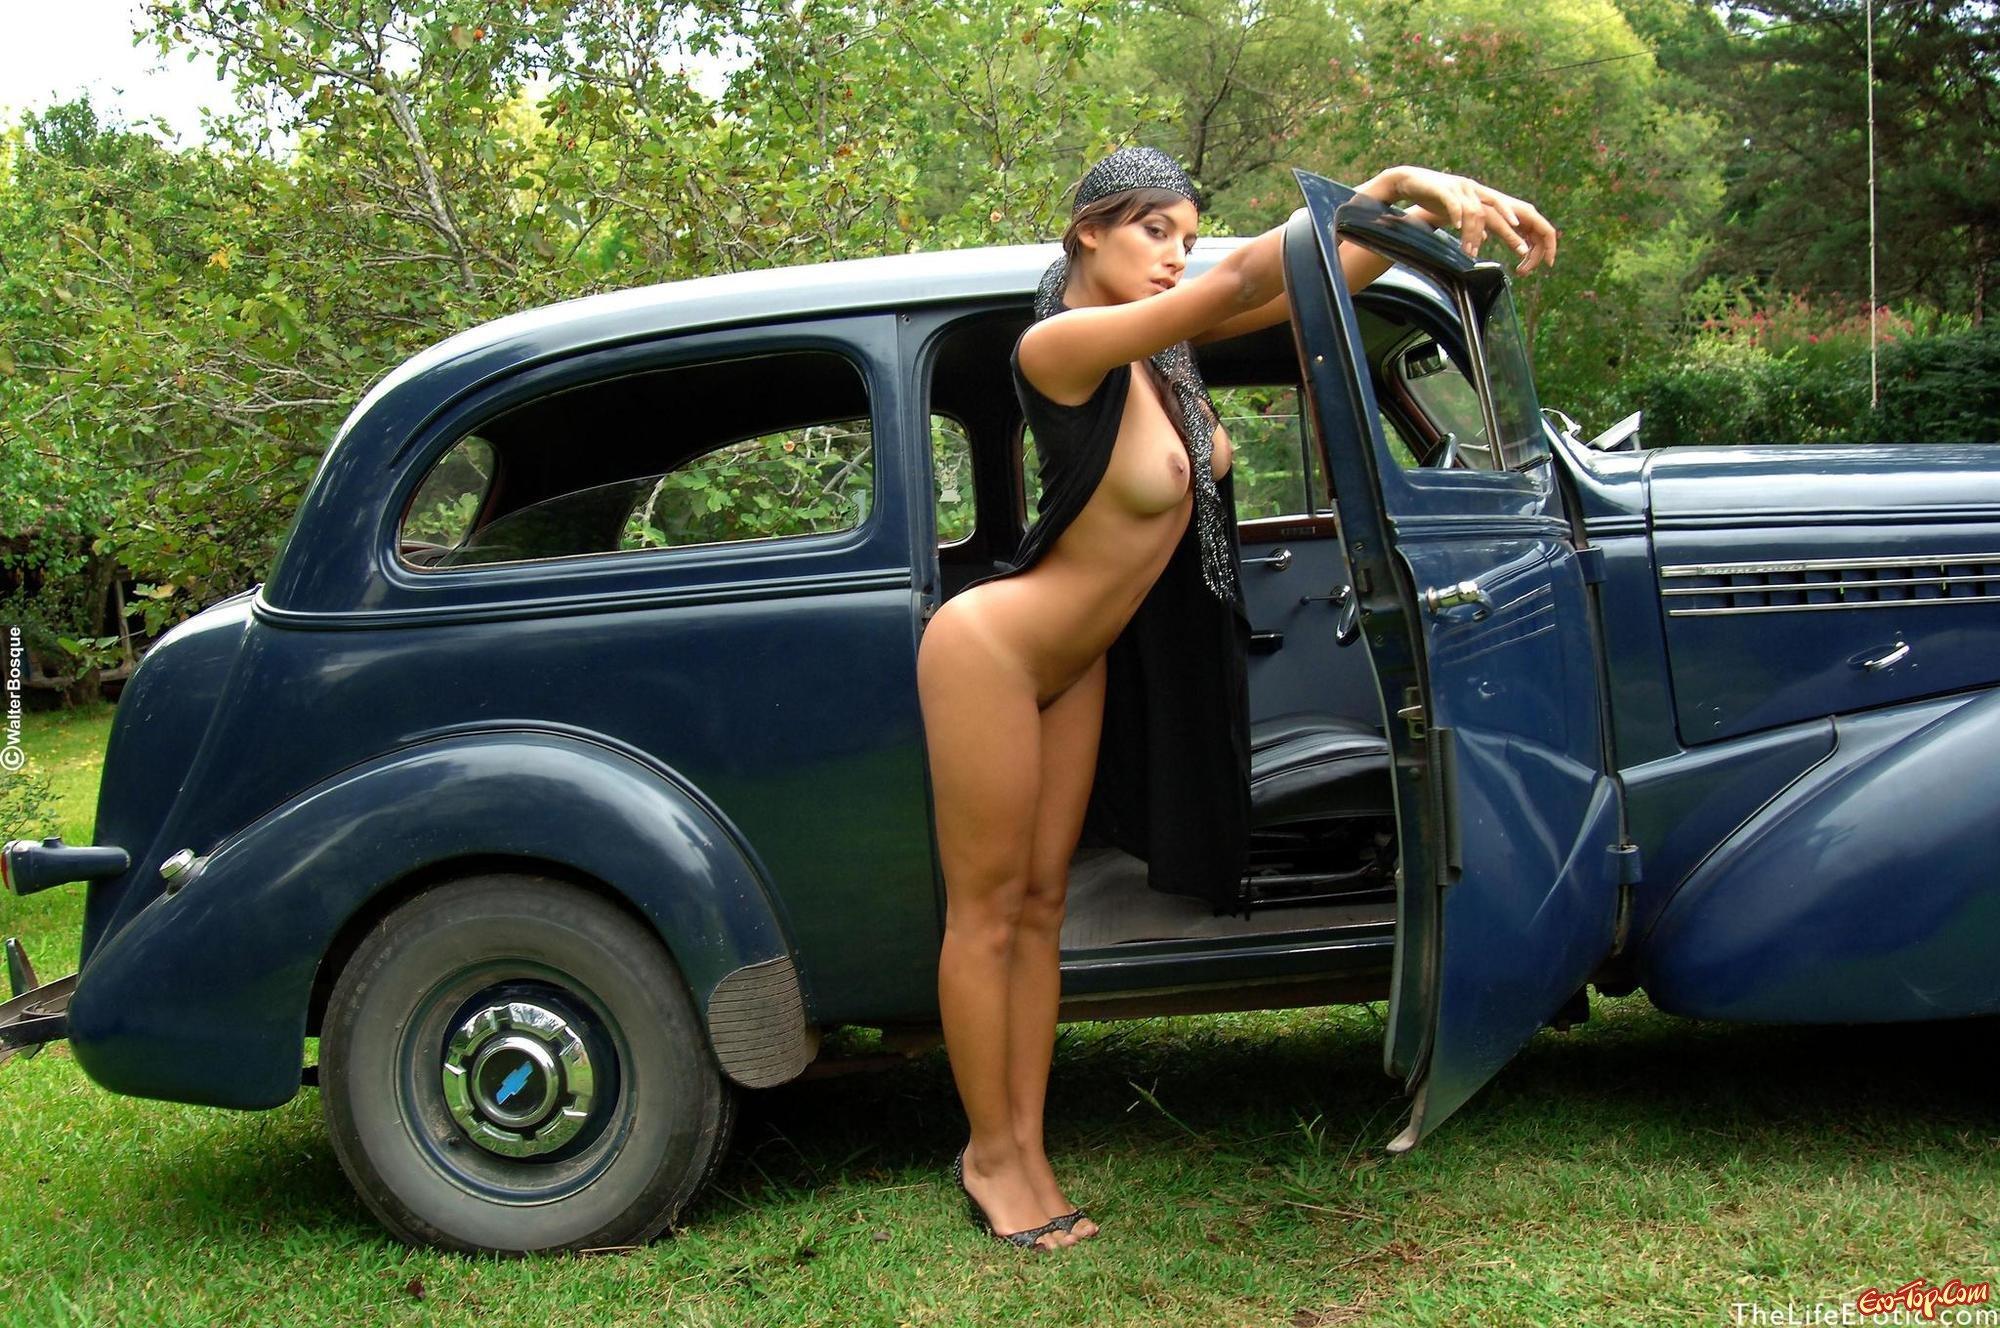 seks-v-avto-foto